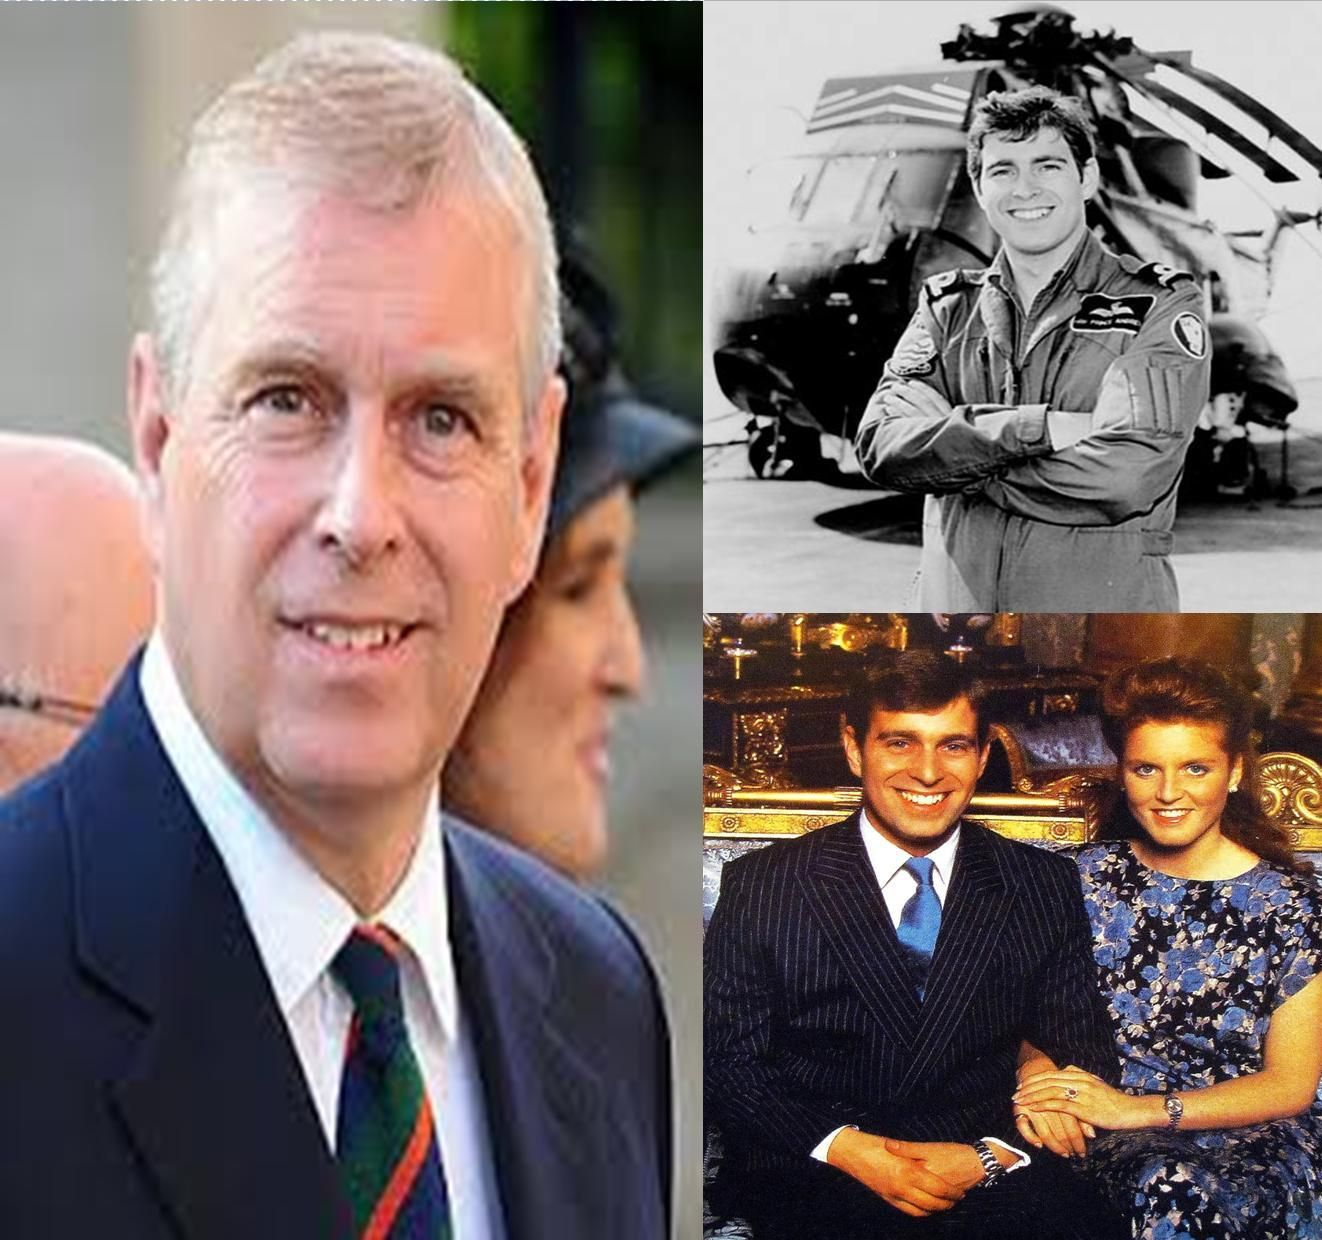 prince andrew duke of york age